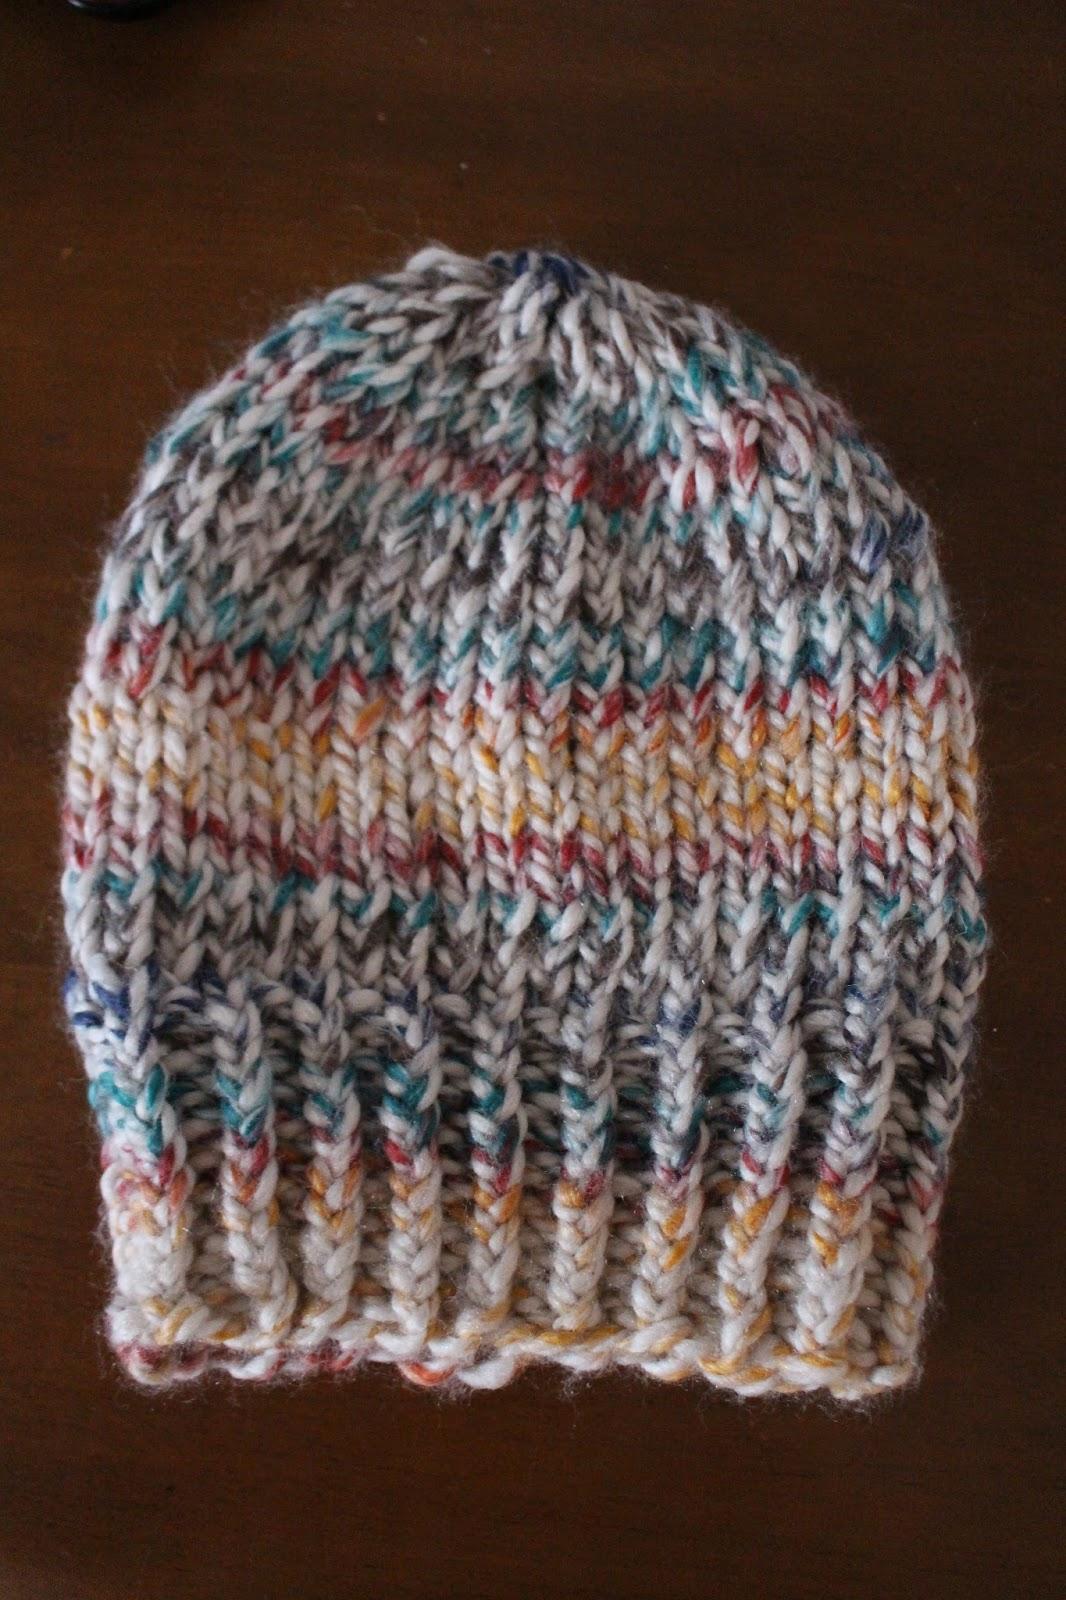 Lively Crochet - Rhythmic Youth